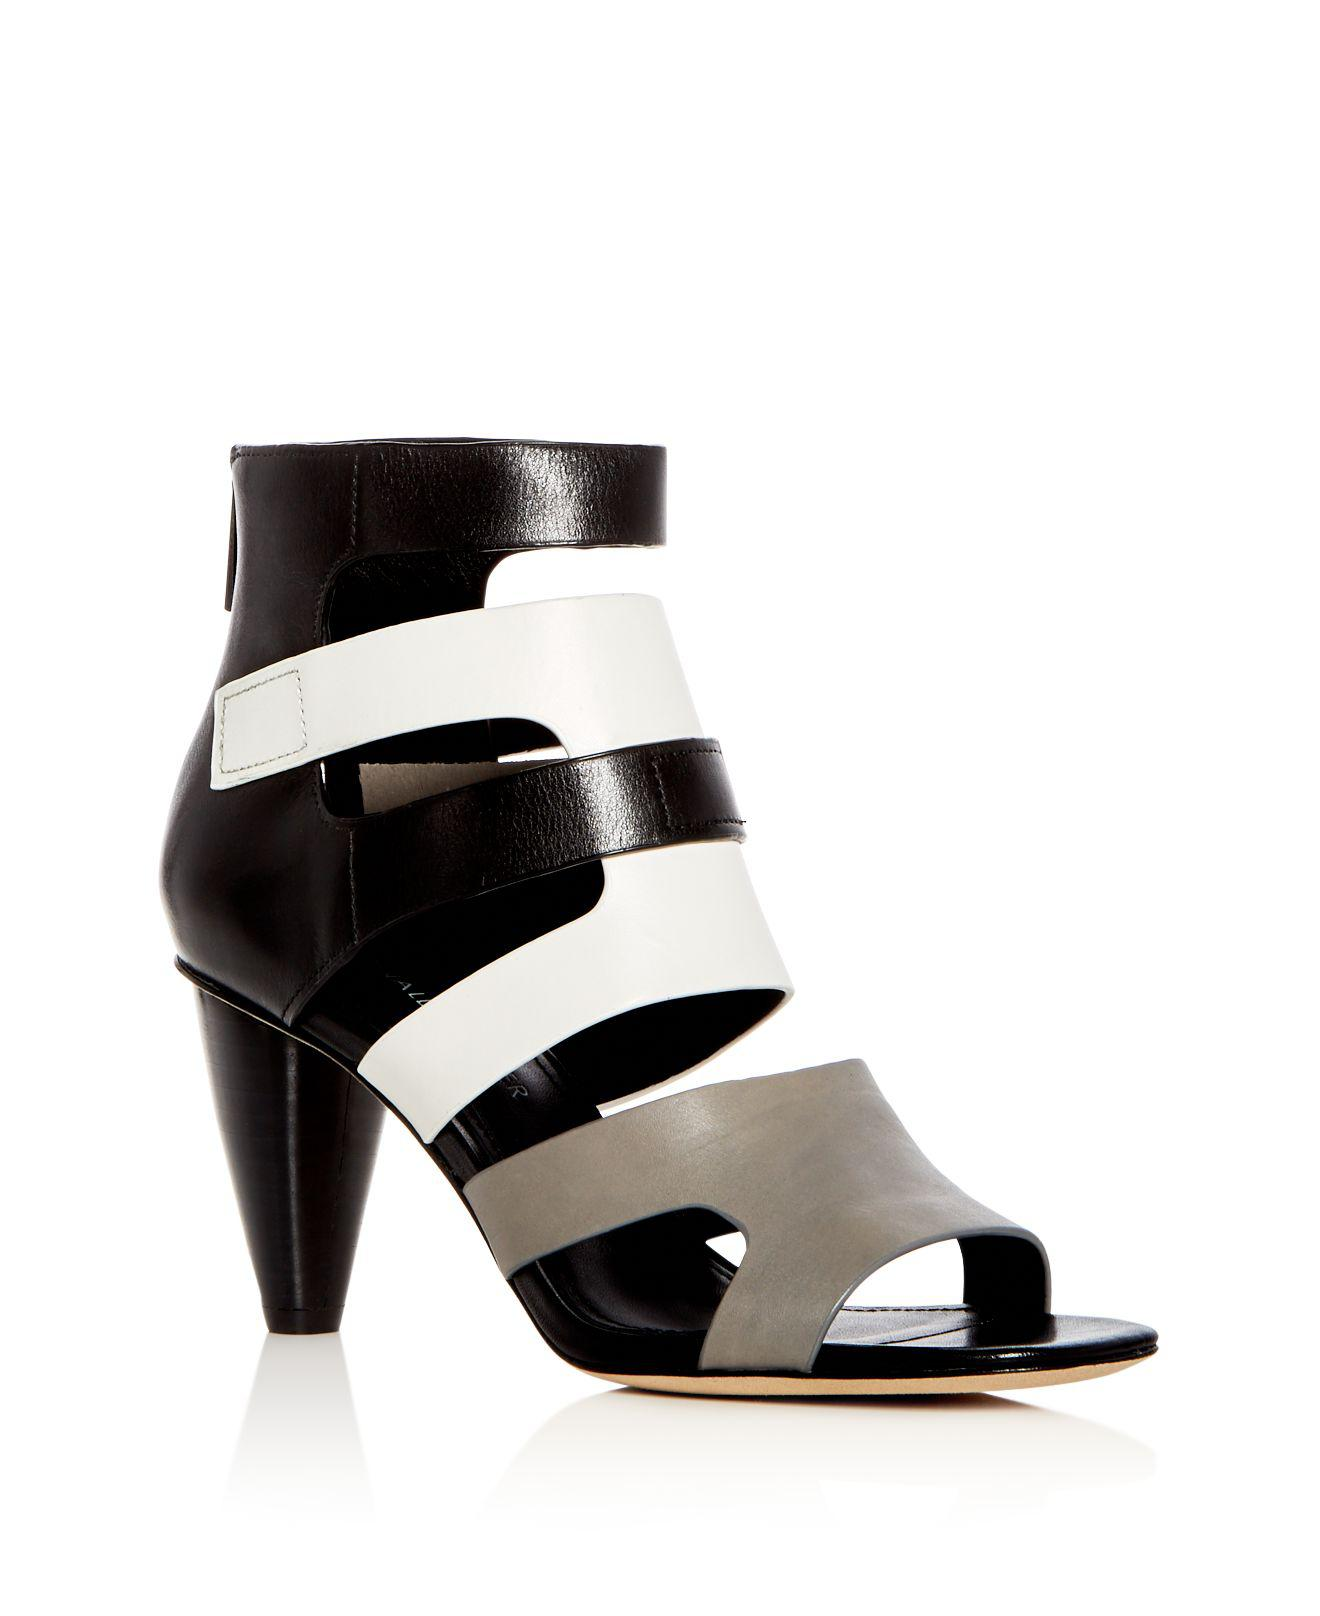 Donald Pliner Women's Watson Gingham-Print Color-Block Leather Block Heel Sandals Qb2Hb4